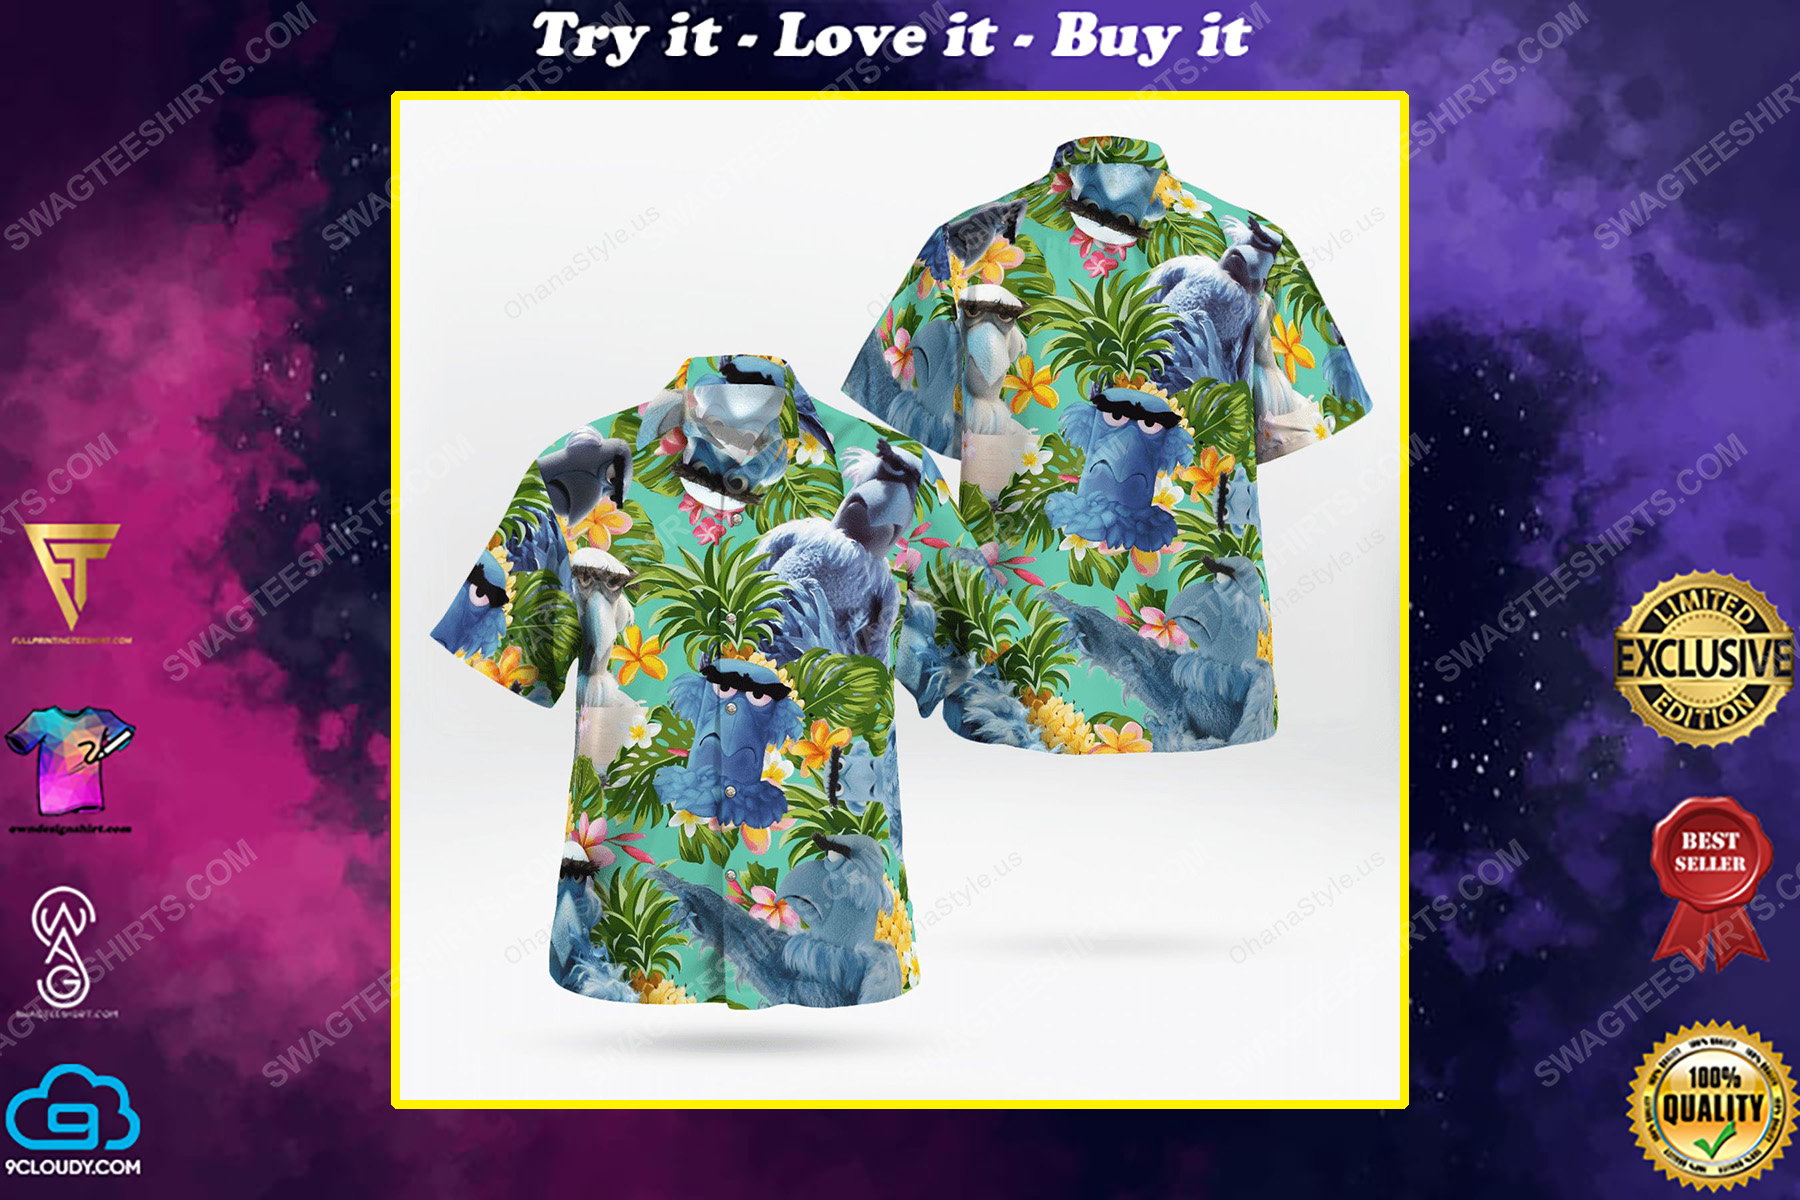 The muppet show sam the eagle hawaiian shirt